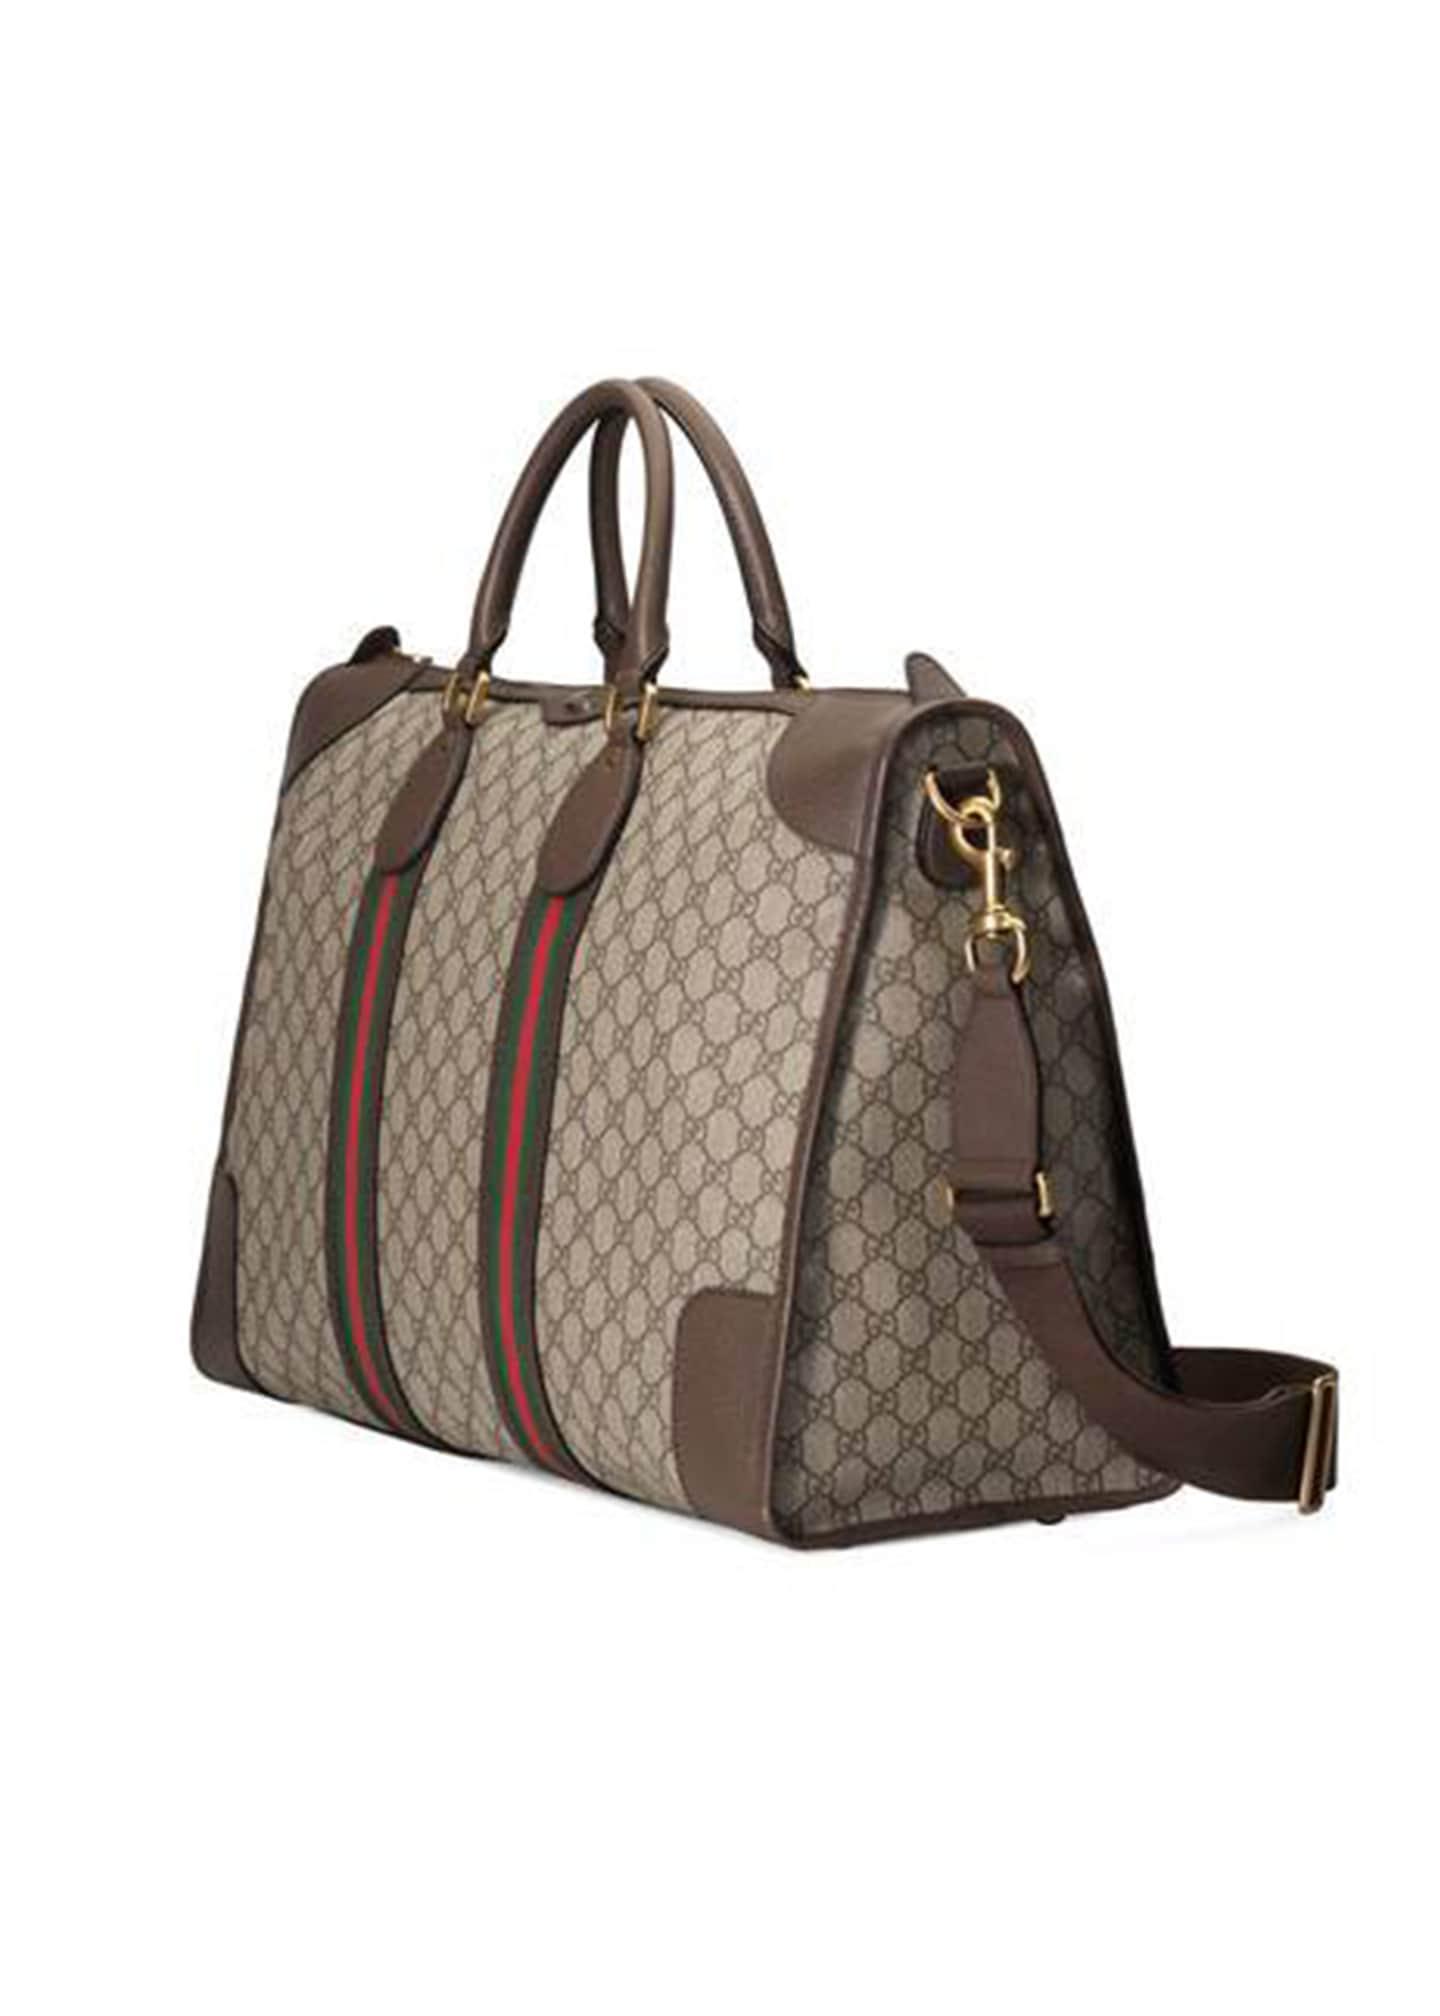 Gucci Men's GG Supreme Medium Explorer Backpack